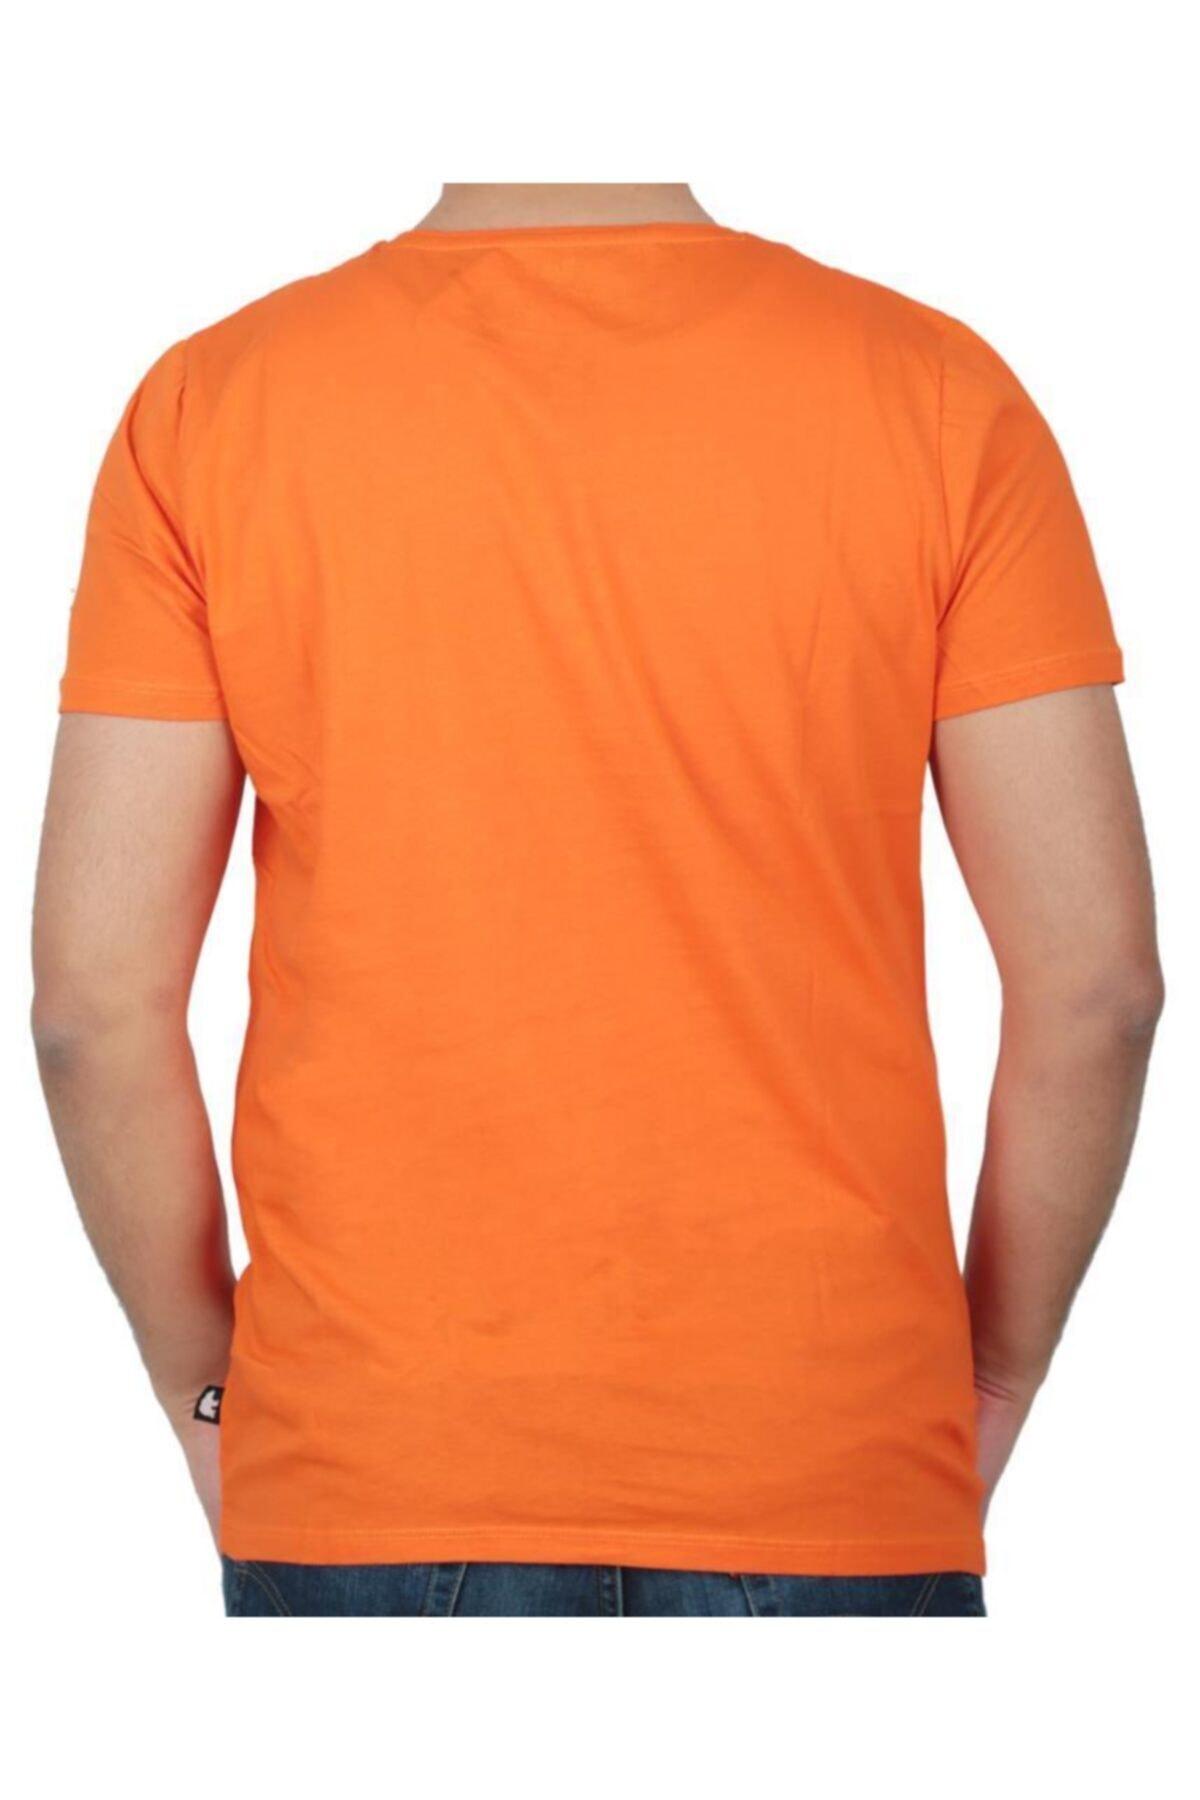 Bad Bear Erkek Turuncu Baskılı T-shirt 19.01.07.002 2